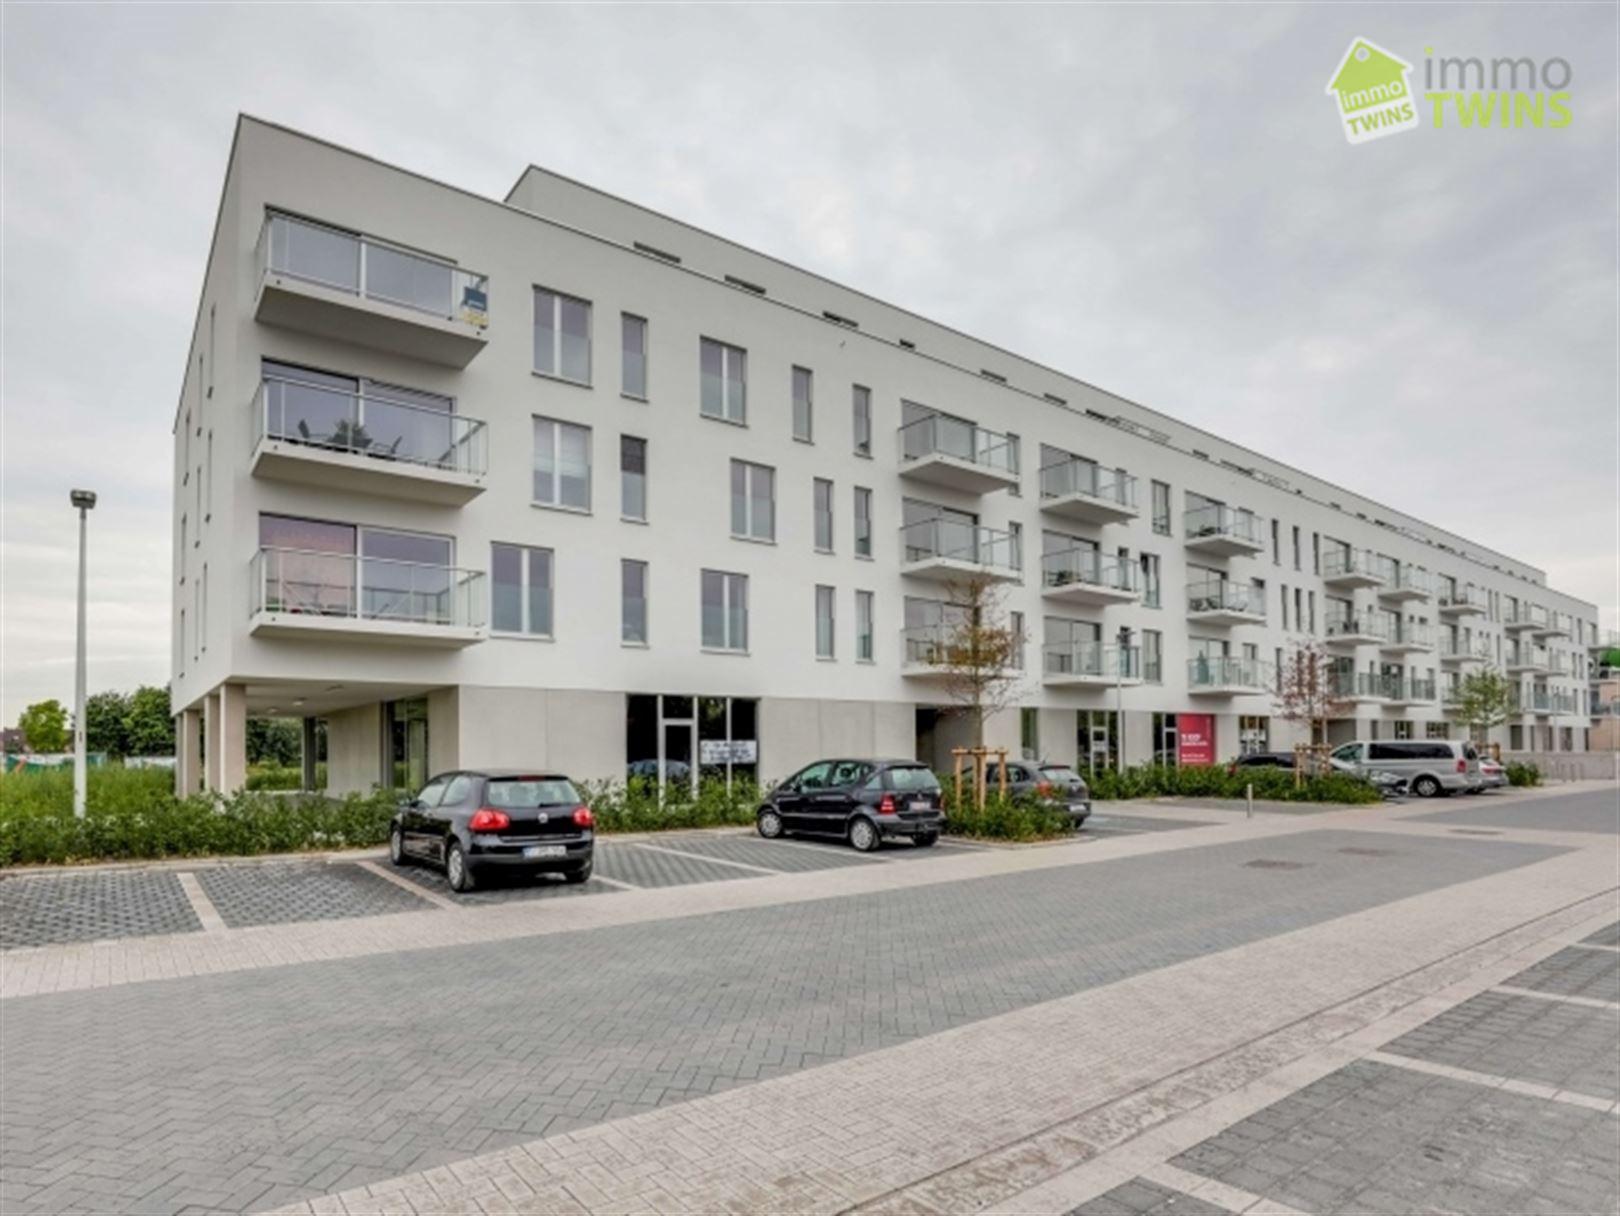 Foto 1 : Appartement te 9160 LOKEREN (België) - Prijs € 750